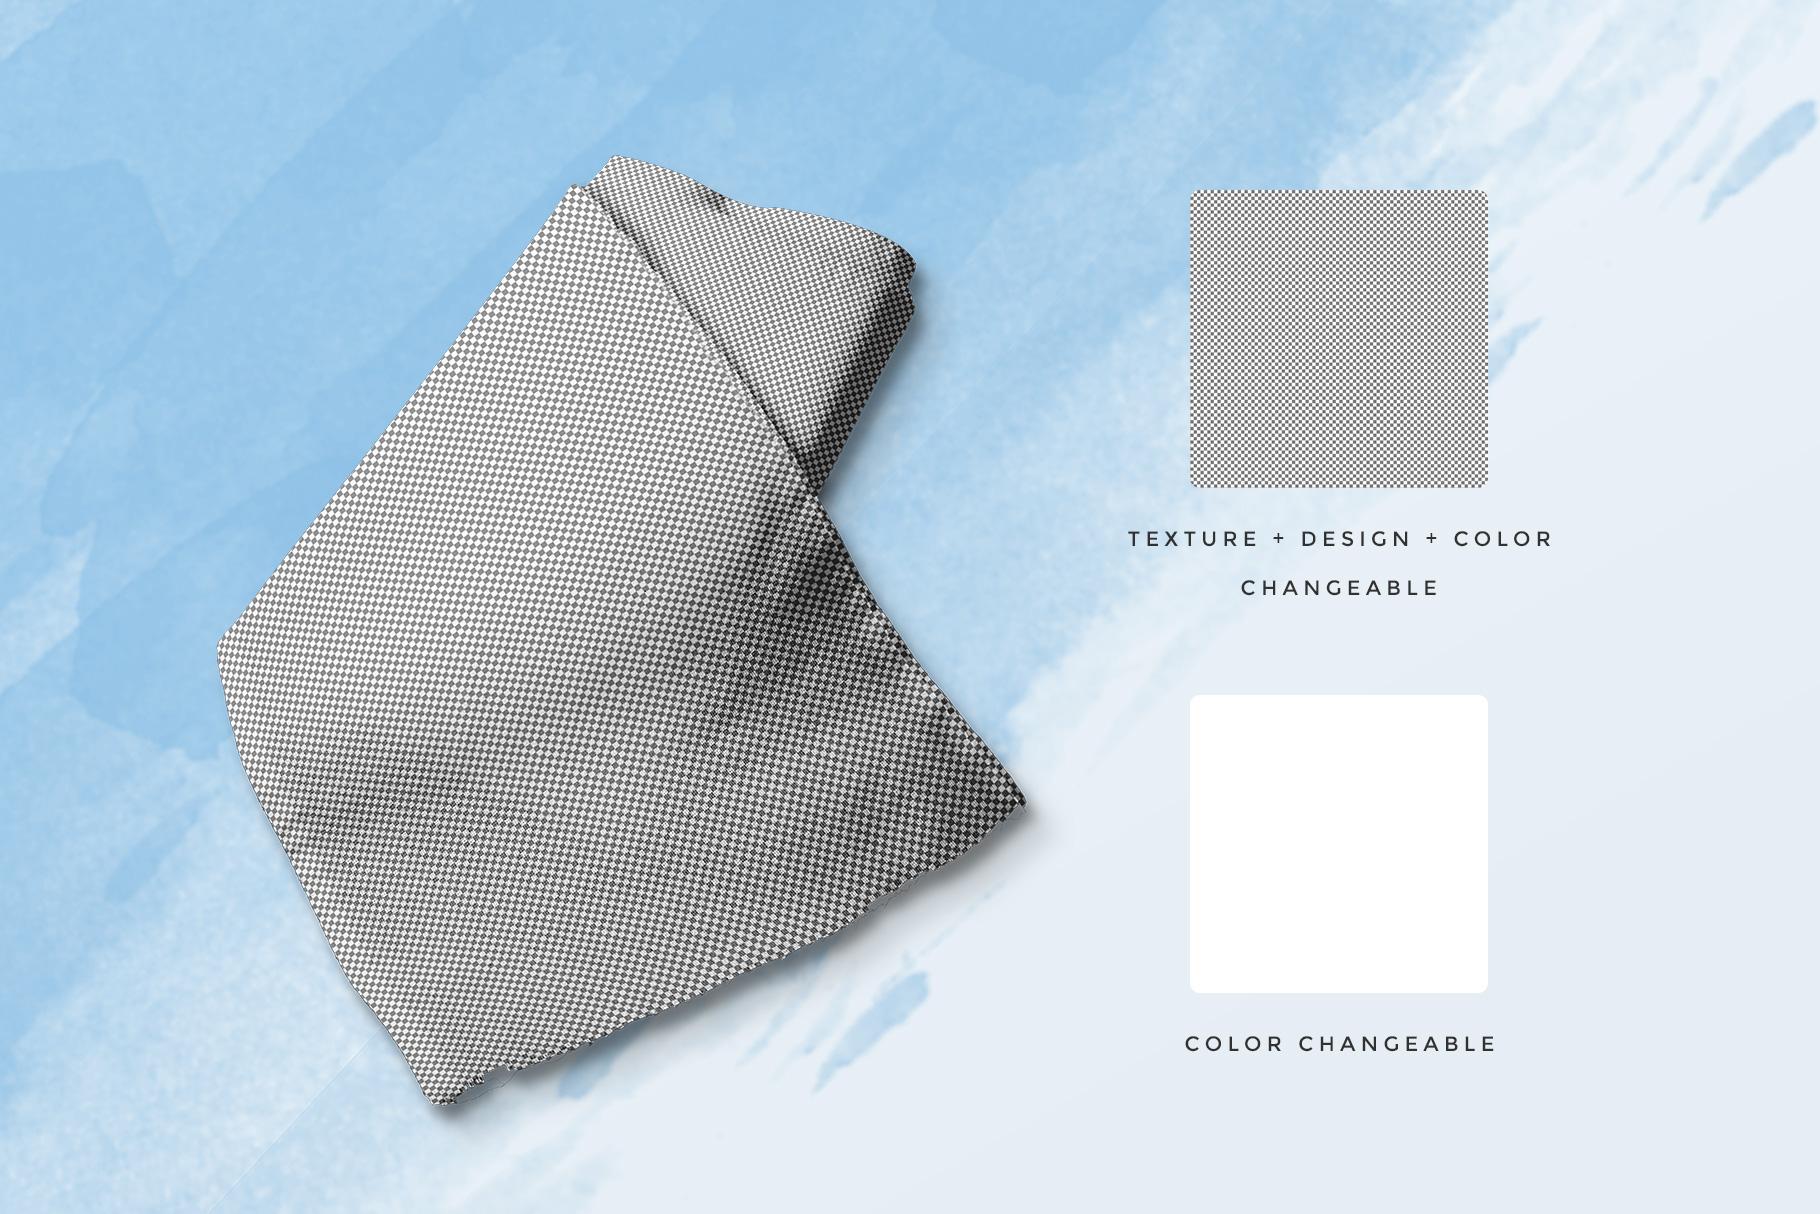 editability of the fabric roll mockup vol.2